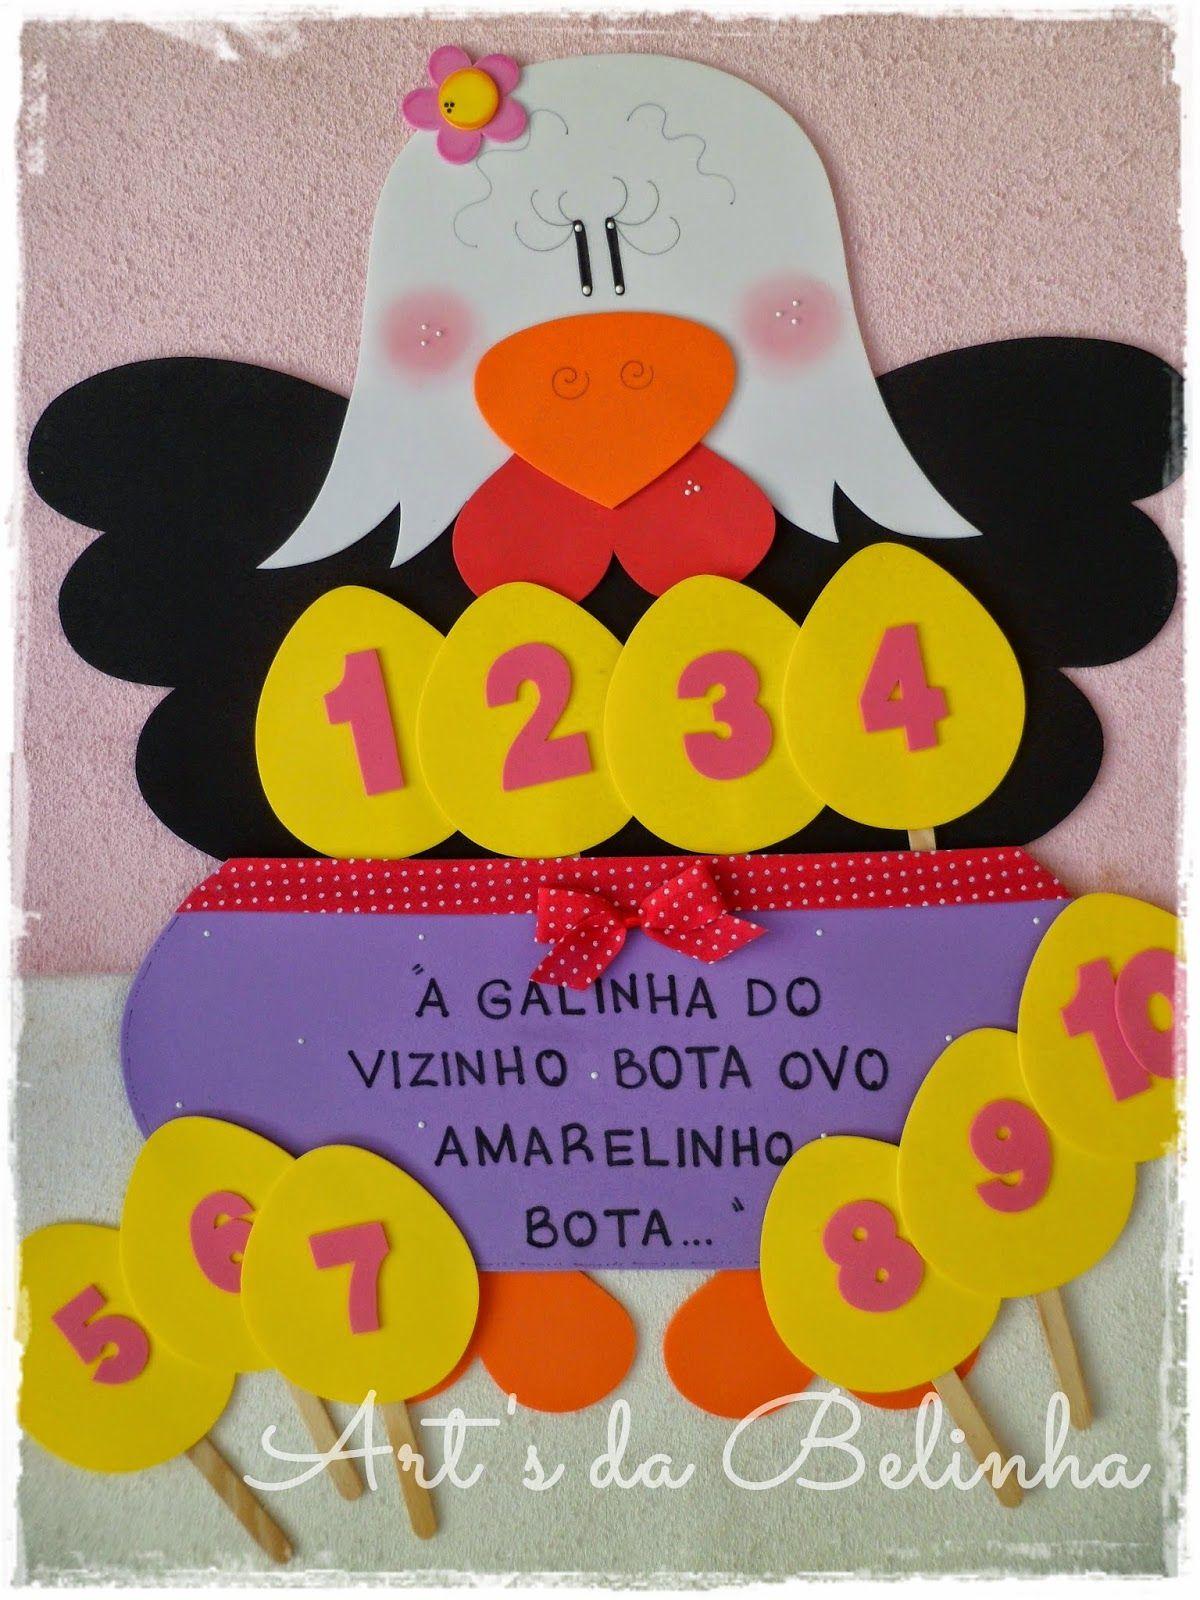 Art S Da Belinha Educacao Infantil Brincadeiras Educacao Infantil